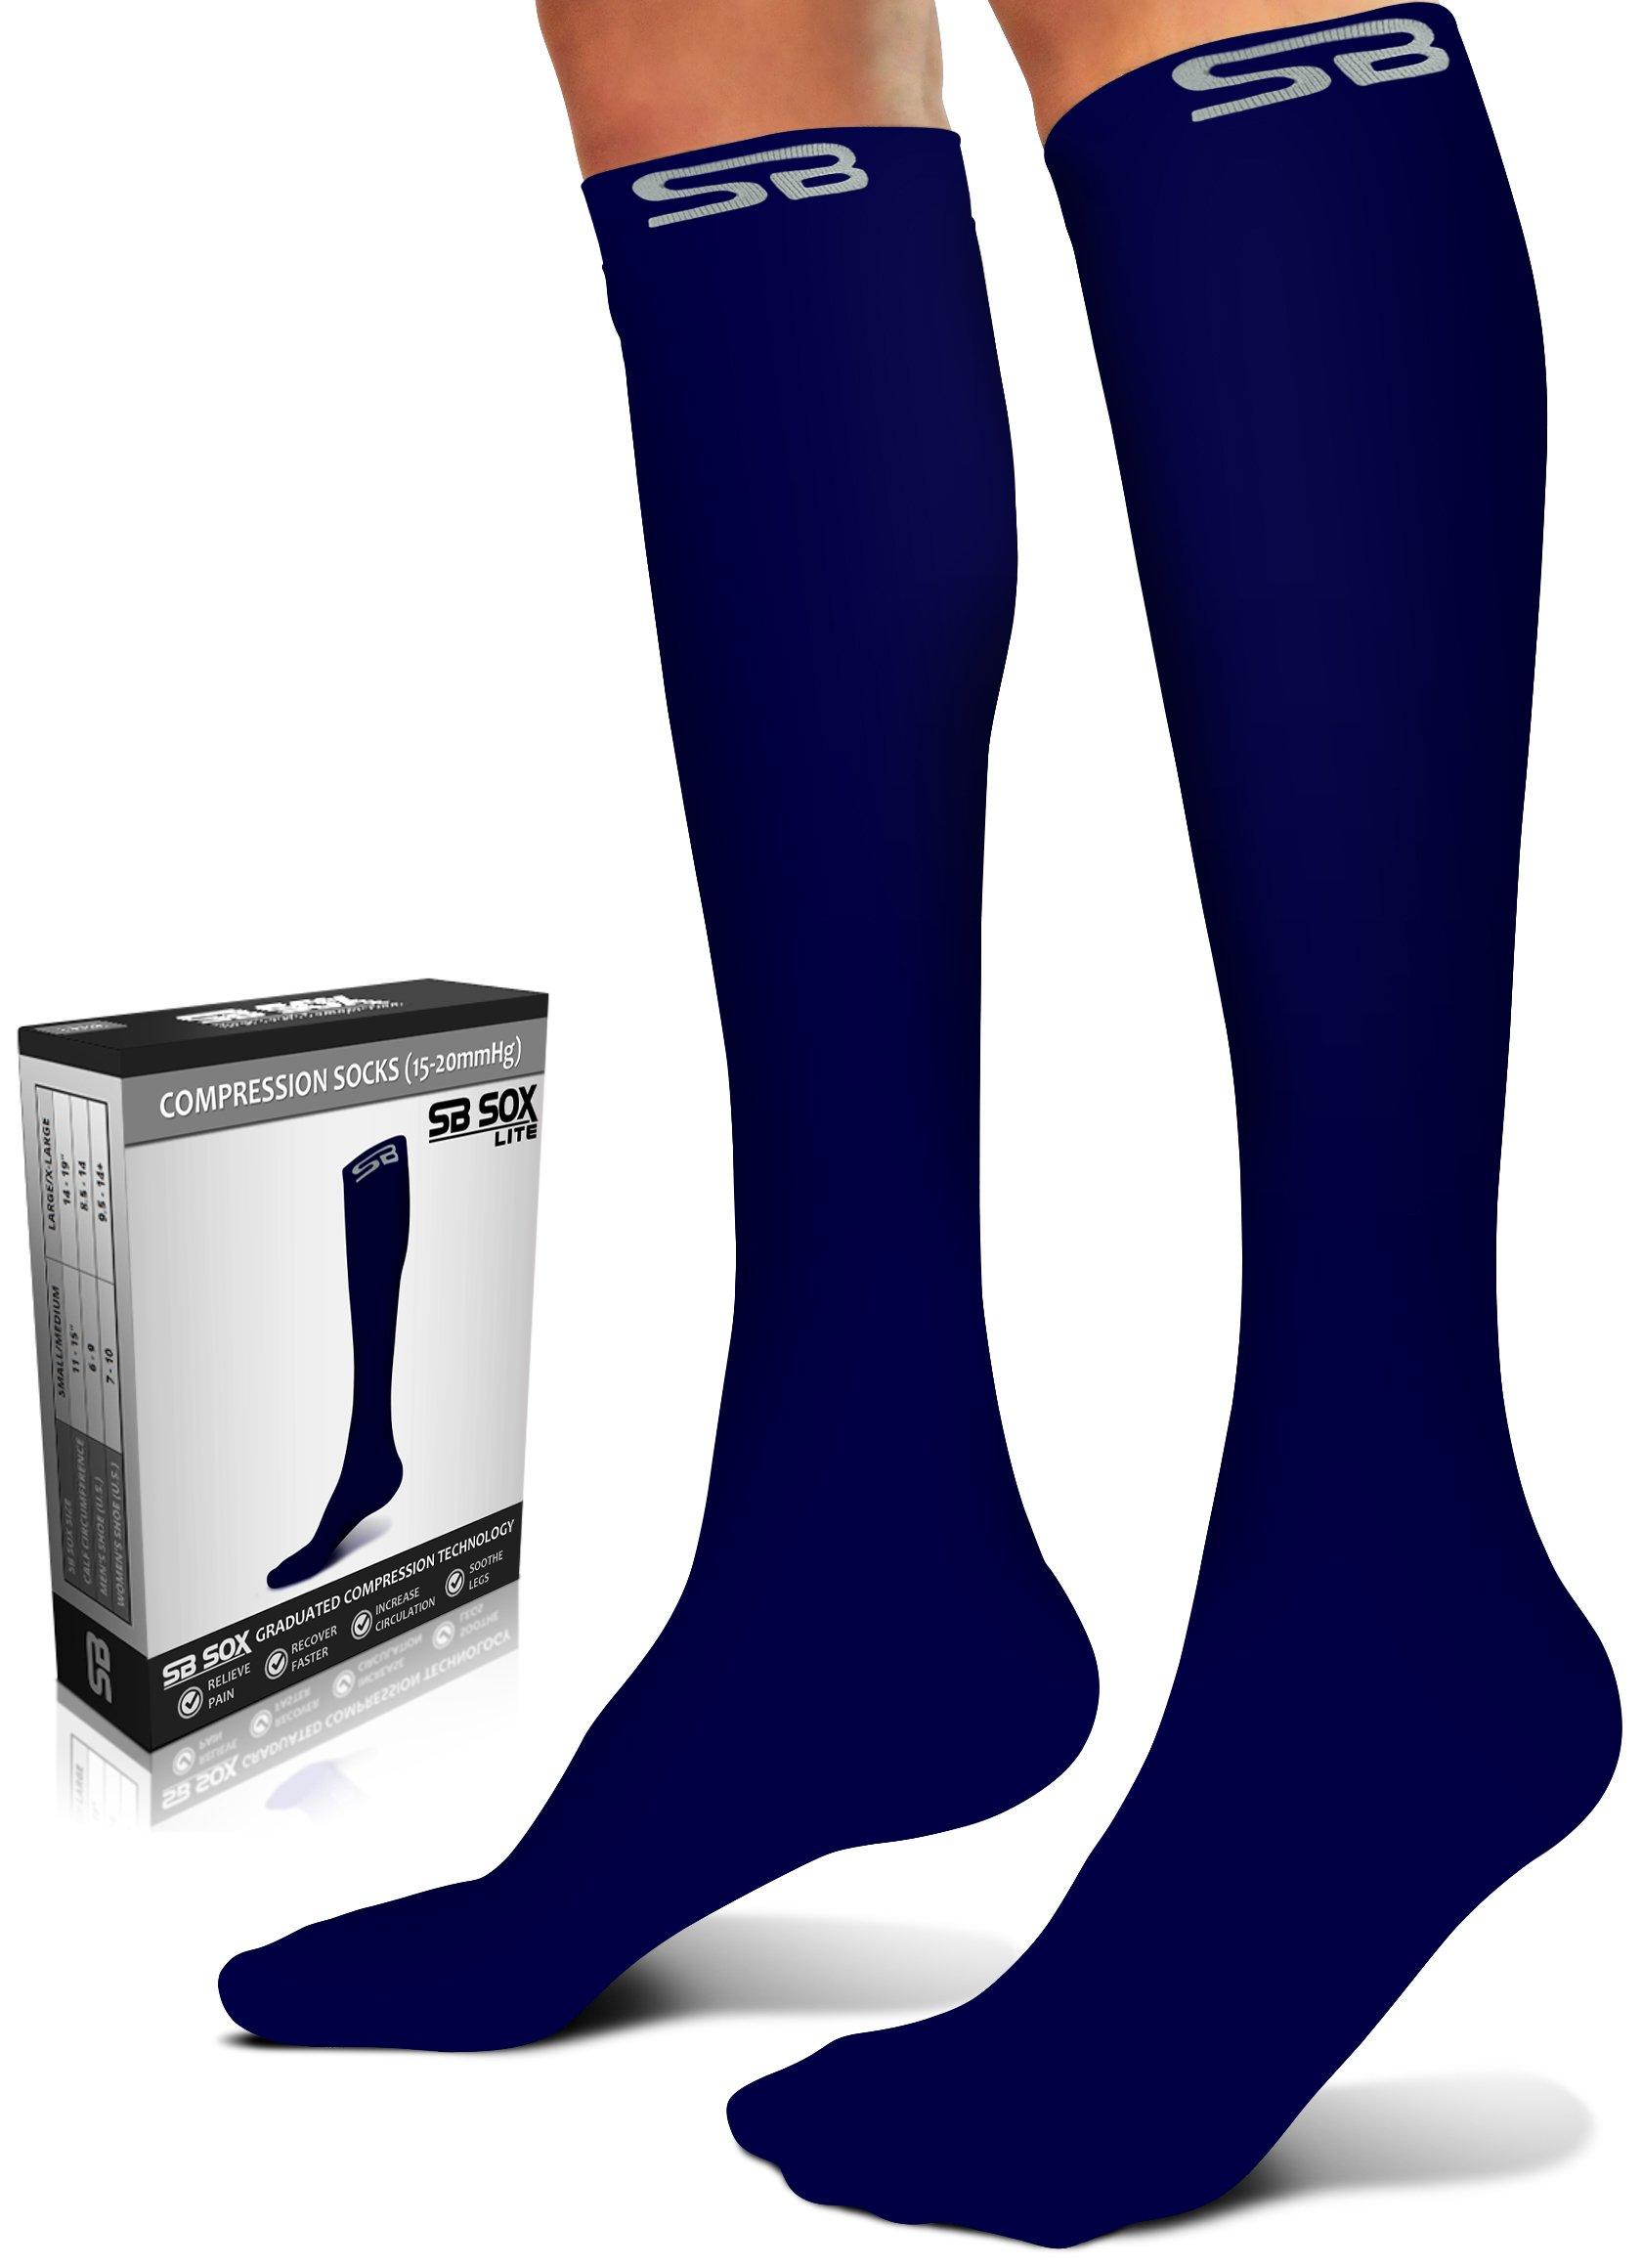 SB SOX Lite Compression Socks (15-20mmHg) for Men & Women - Best Stockings for Running, Medical, Athletic, Edema, Diabetic, Varicose Veins, Travel, Pregnancy (Solid - Navy, S/M)